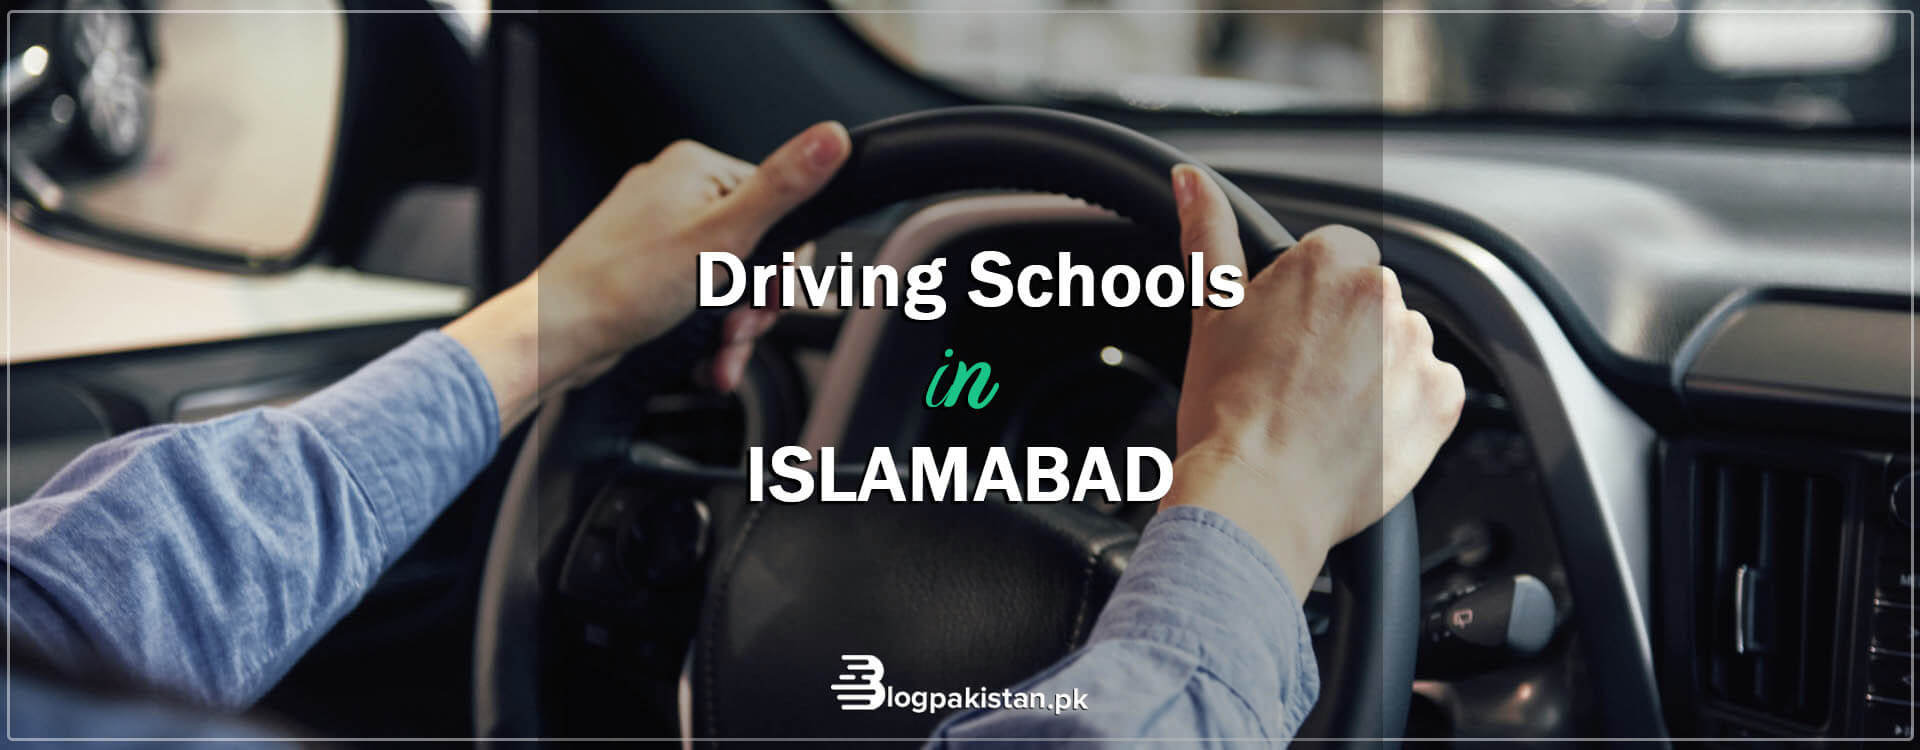 Driving Schools in Islamabad